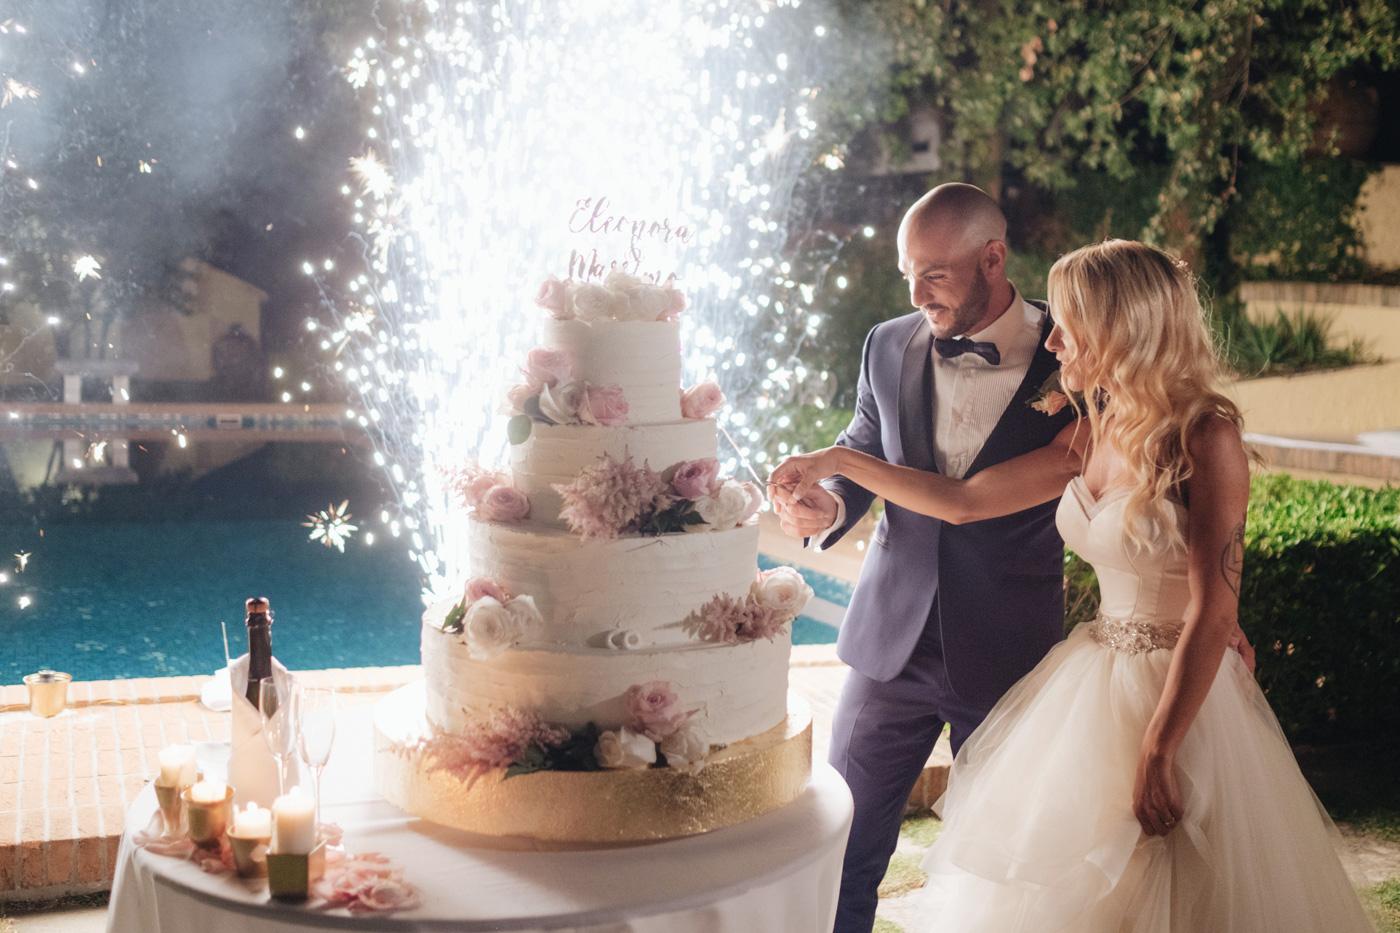 Matrimoni all'italiana wedding photographer italy-150.jpg